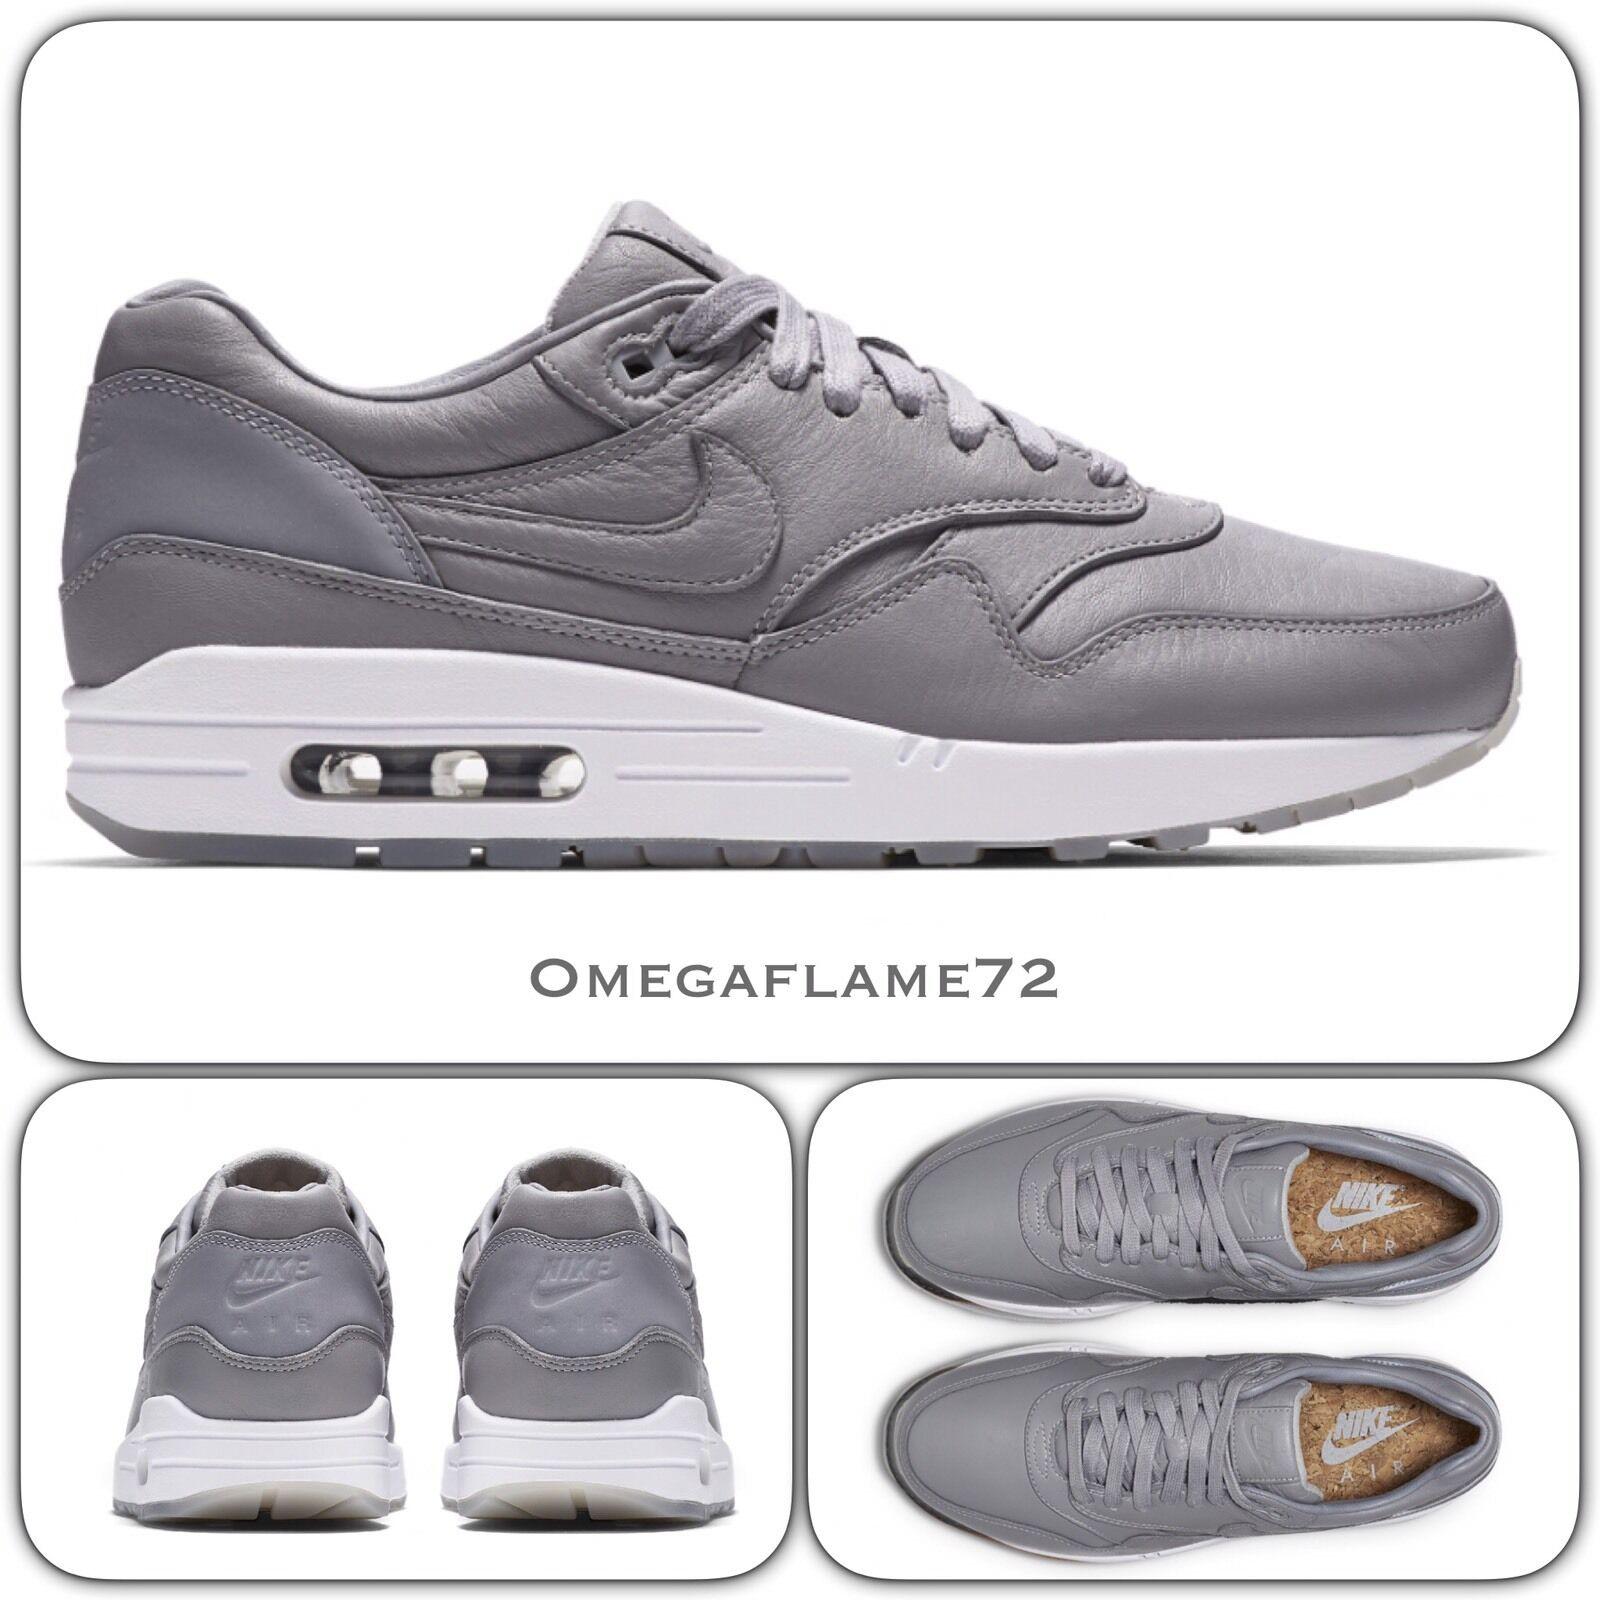 NikeLab Air Max 1 Deluxe Pinnacle Wolf  Gris Gris Gris  859554-0028 EU 42.5 US 9 Nike b1a796